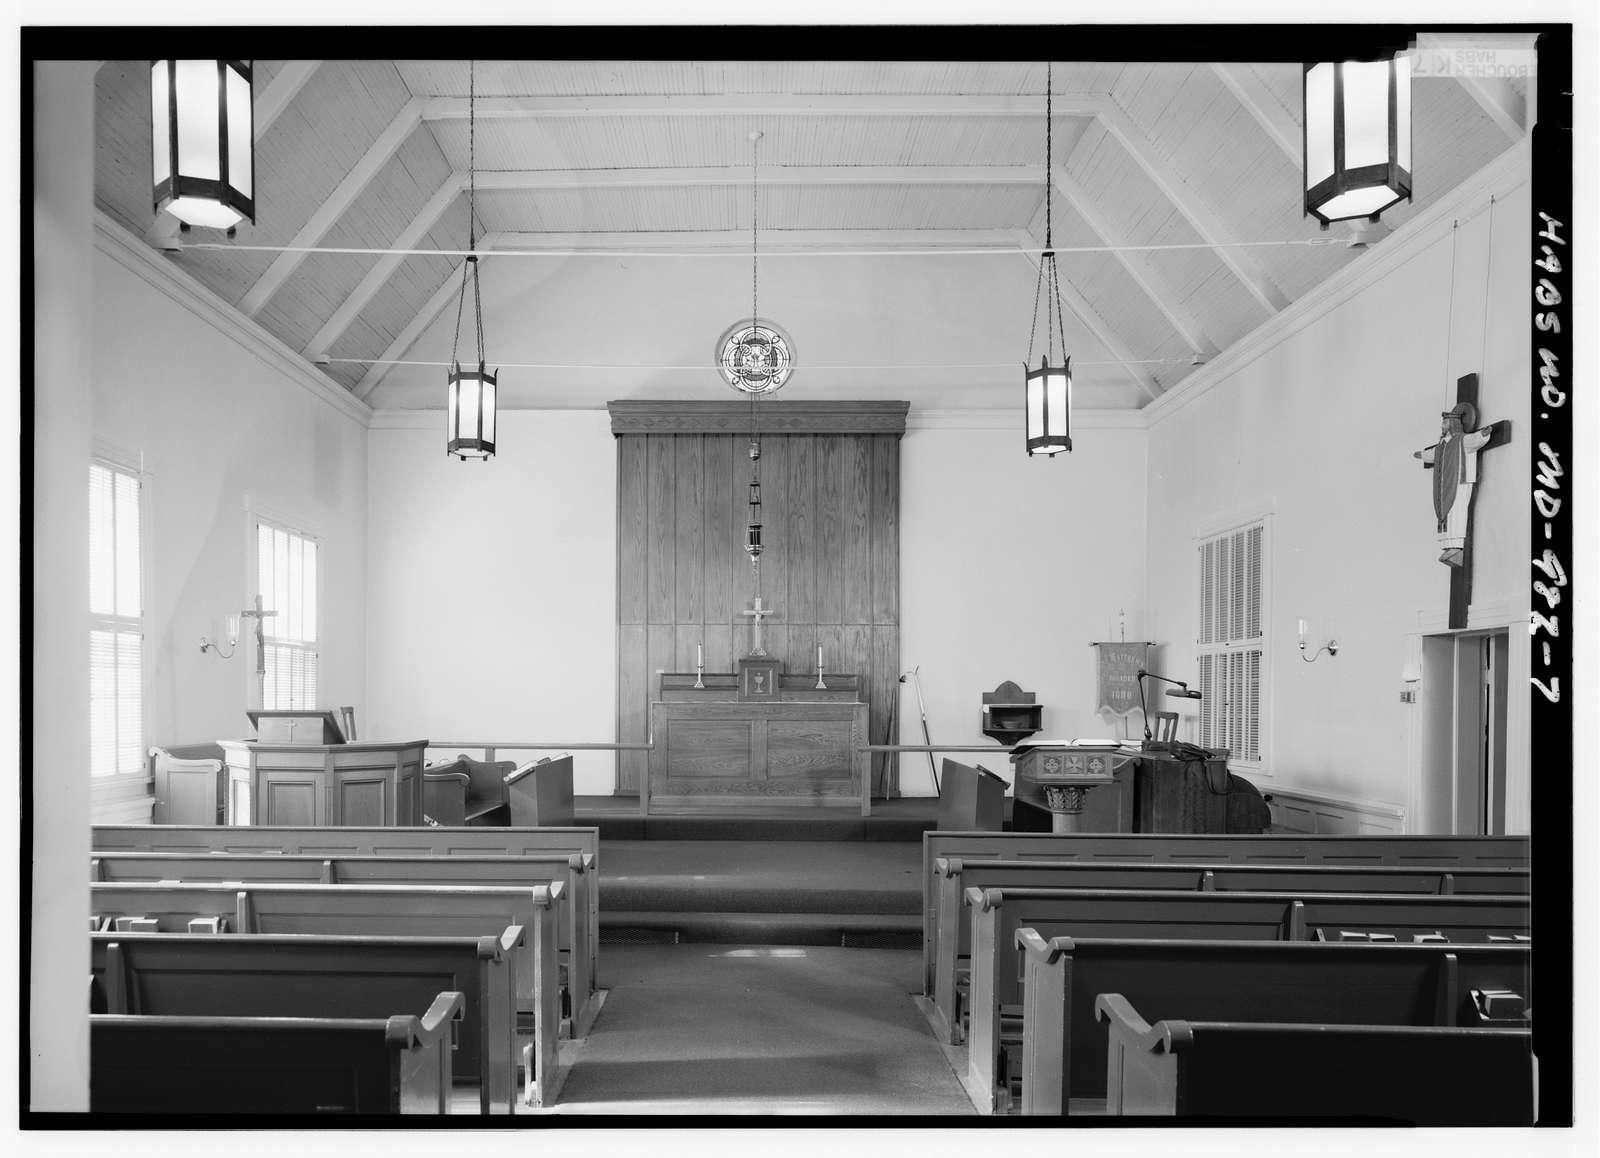 Addison Chapel, 5610 Addison Road, Seat Pleasant, Prince George's County, MD